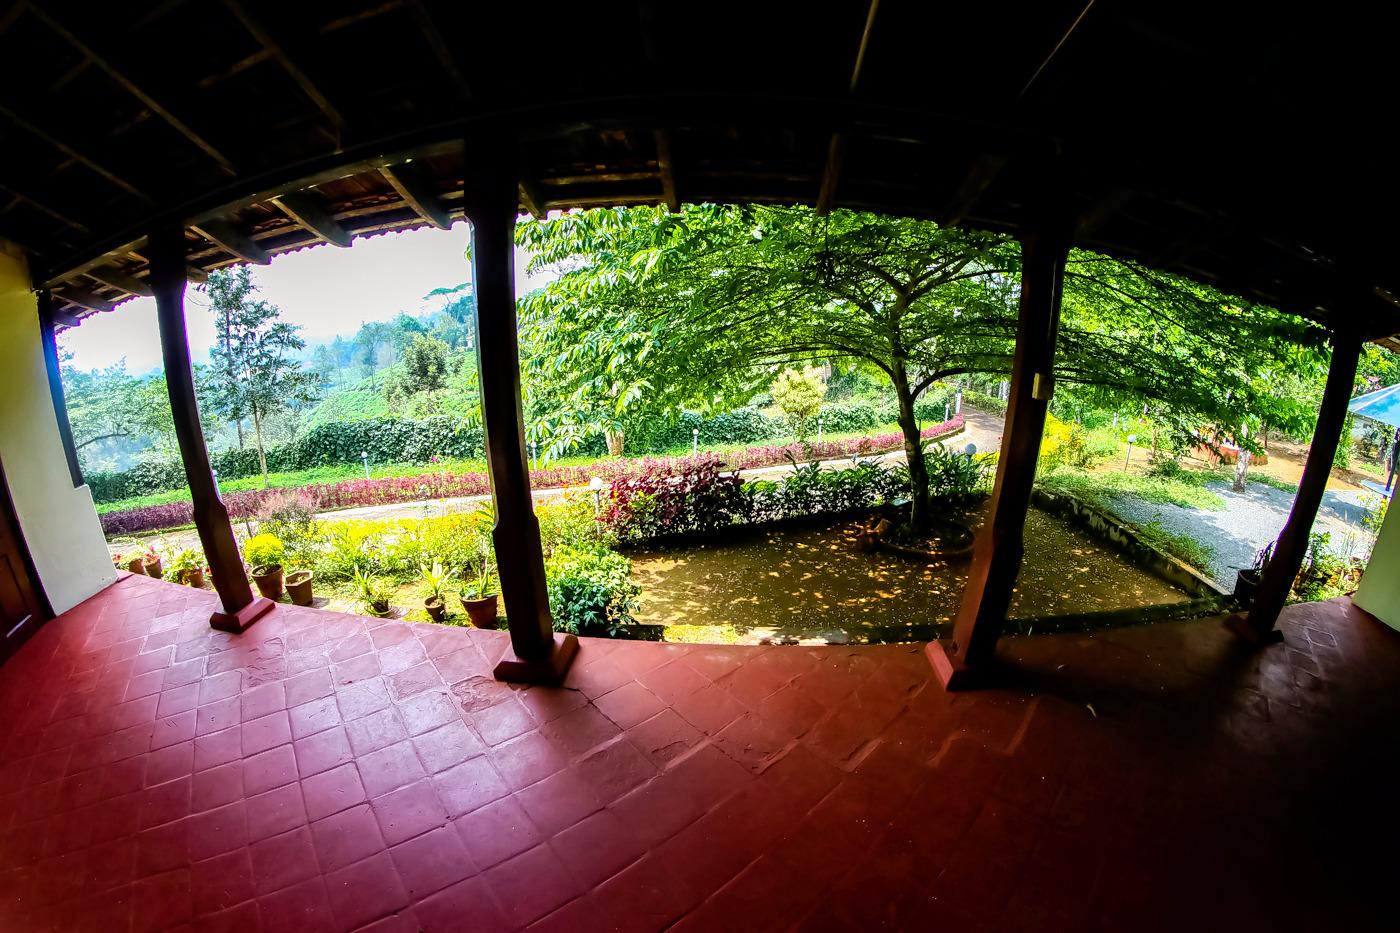 1542197983_rippon_bungalow-2540.jpg